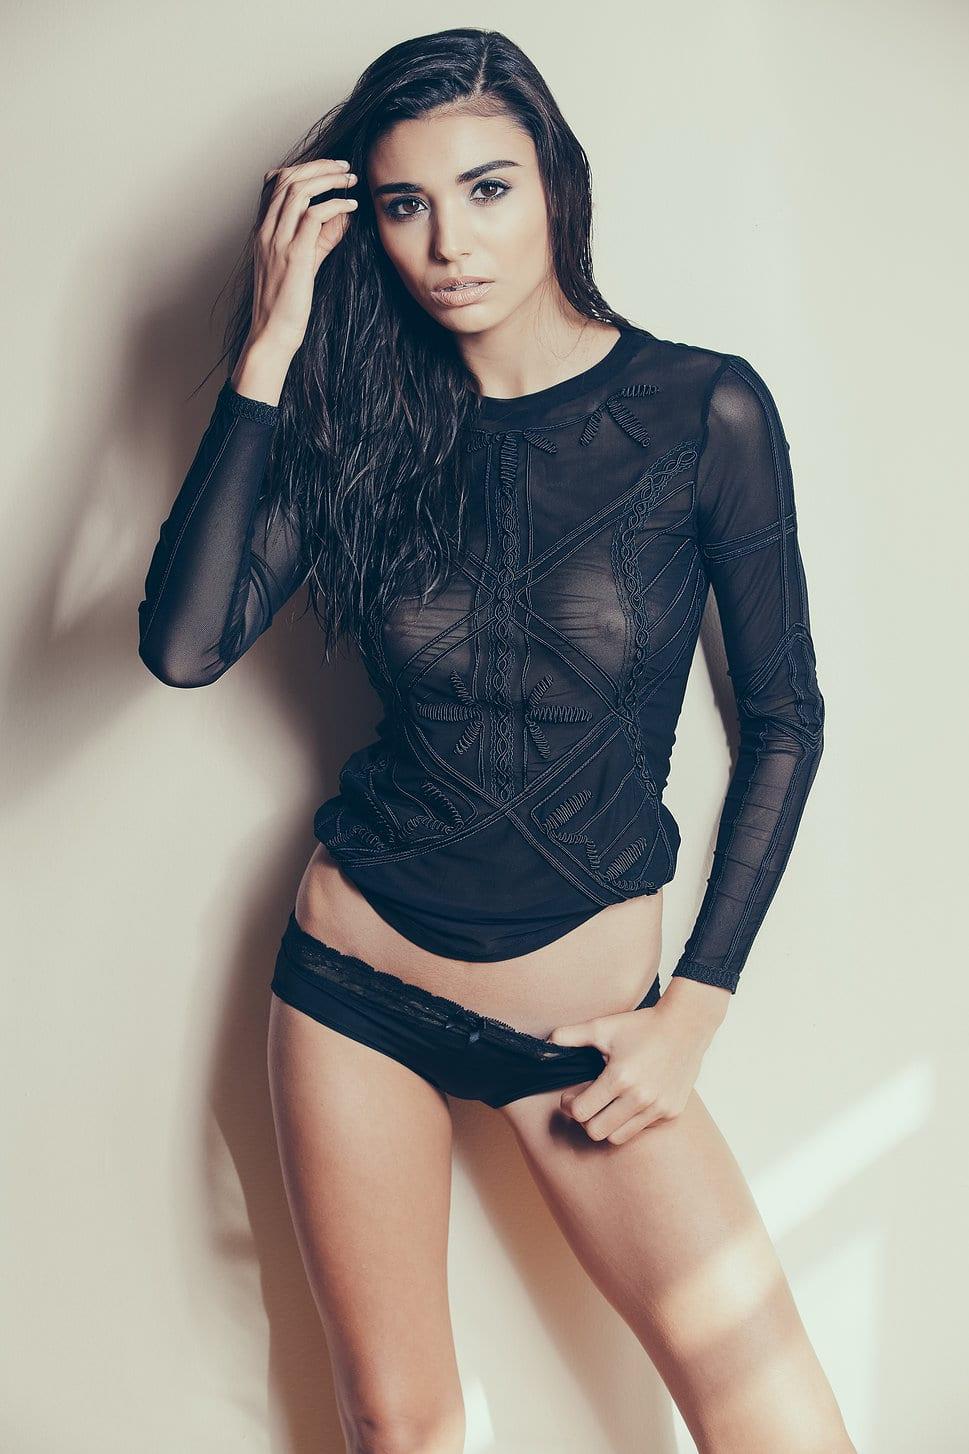 Photos Melina DiMarco nudes (88 photo), Tits, Hot, Boobs, in bikini 2015